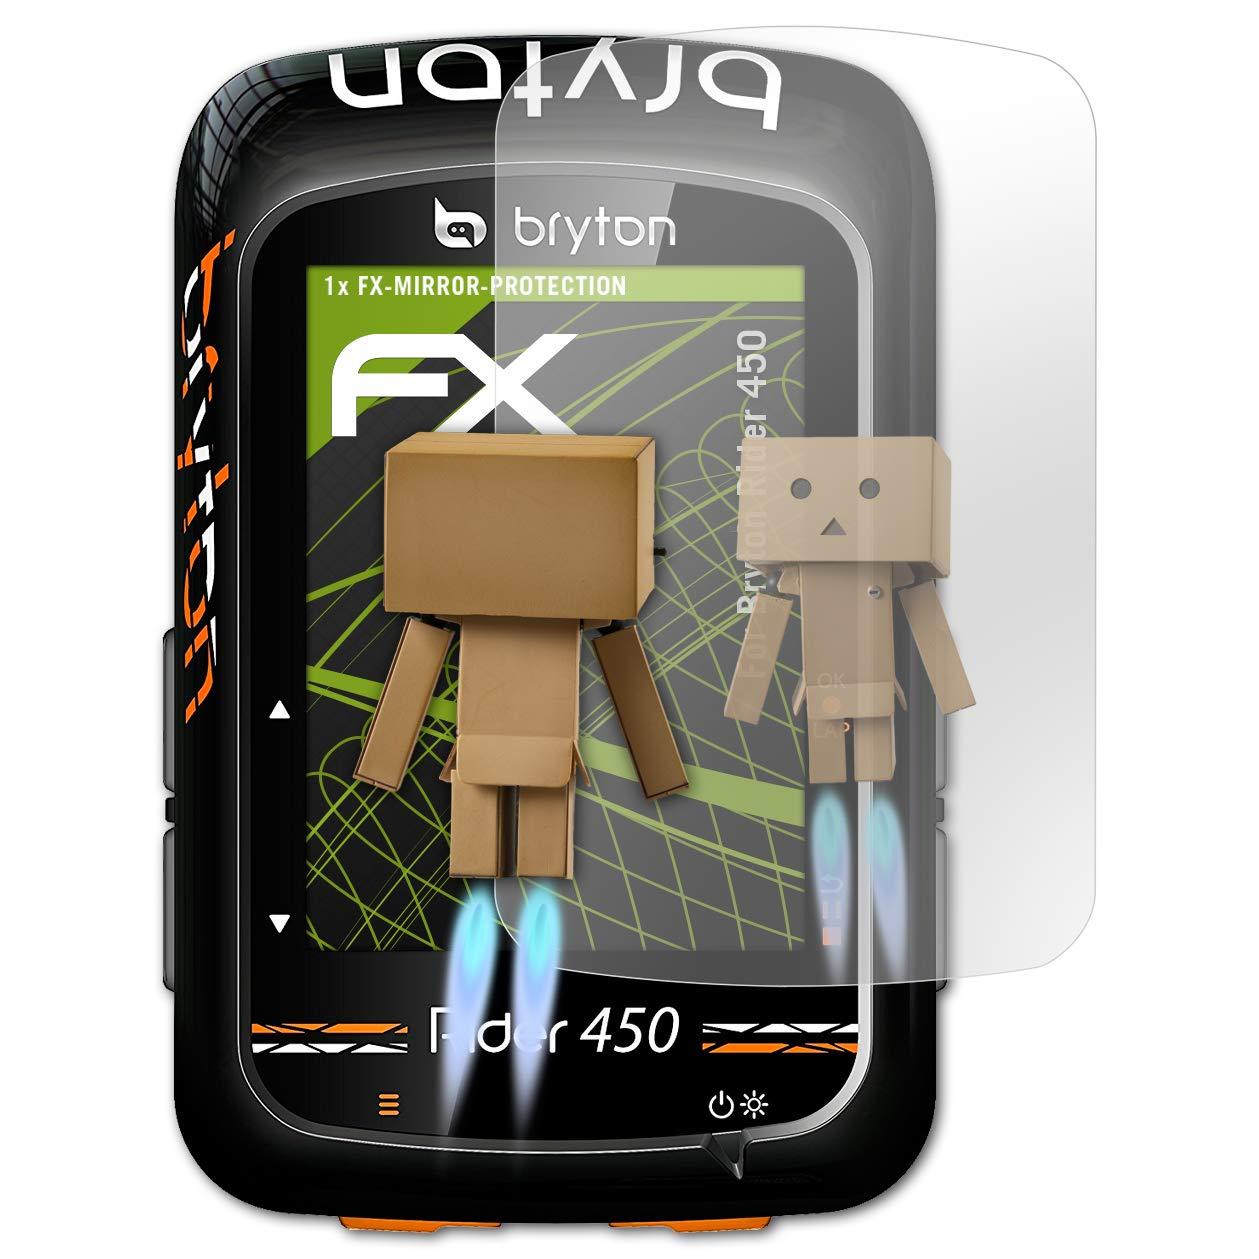 atFoliX Protecci/ón de Pantalla para Bryton Rider 450 L/ámina Protectora Espejo Efecto Espejo FX Protector de Pantalla Espejo